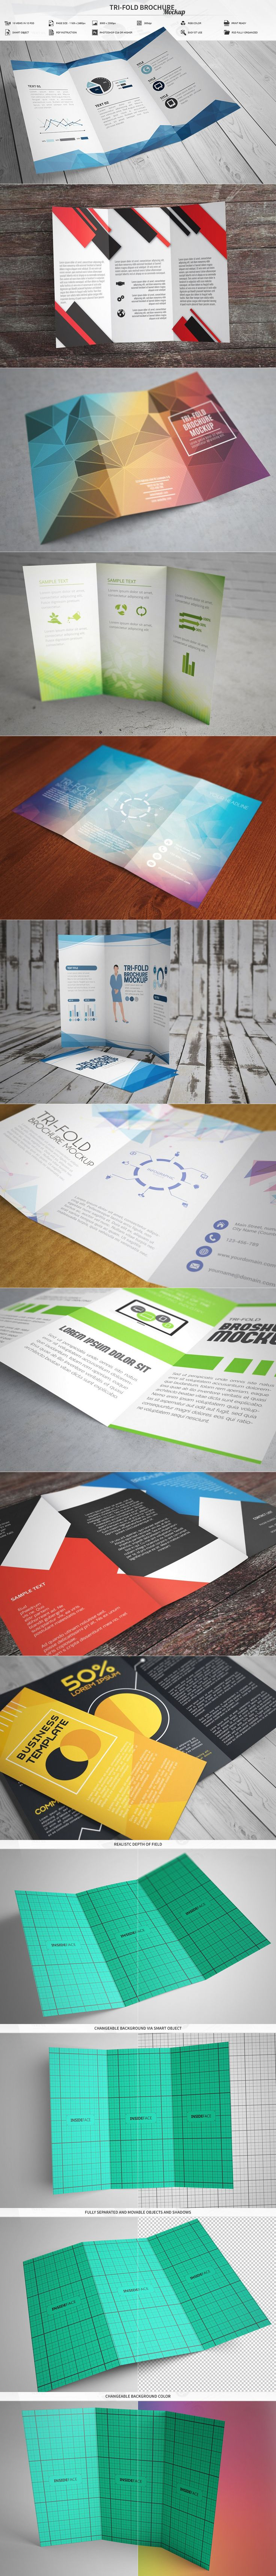 Tri-Fold Brochure Mockup by MassDream on @creativemarket